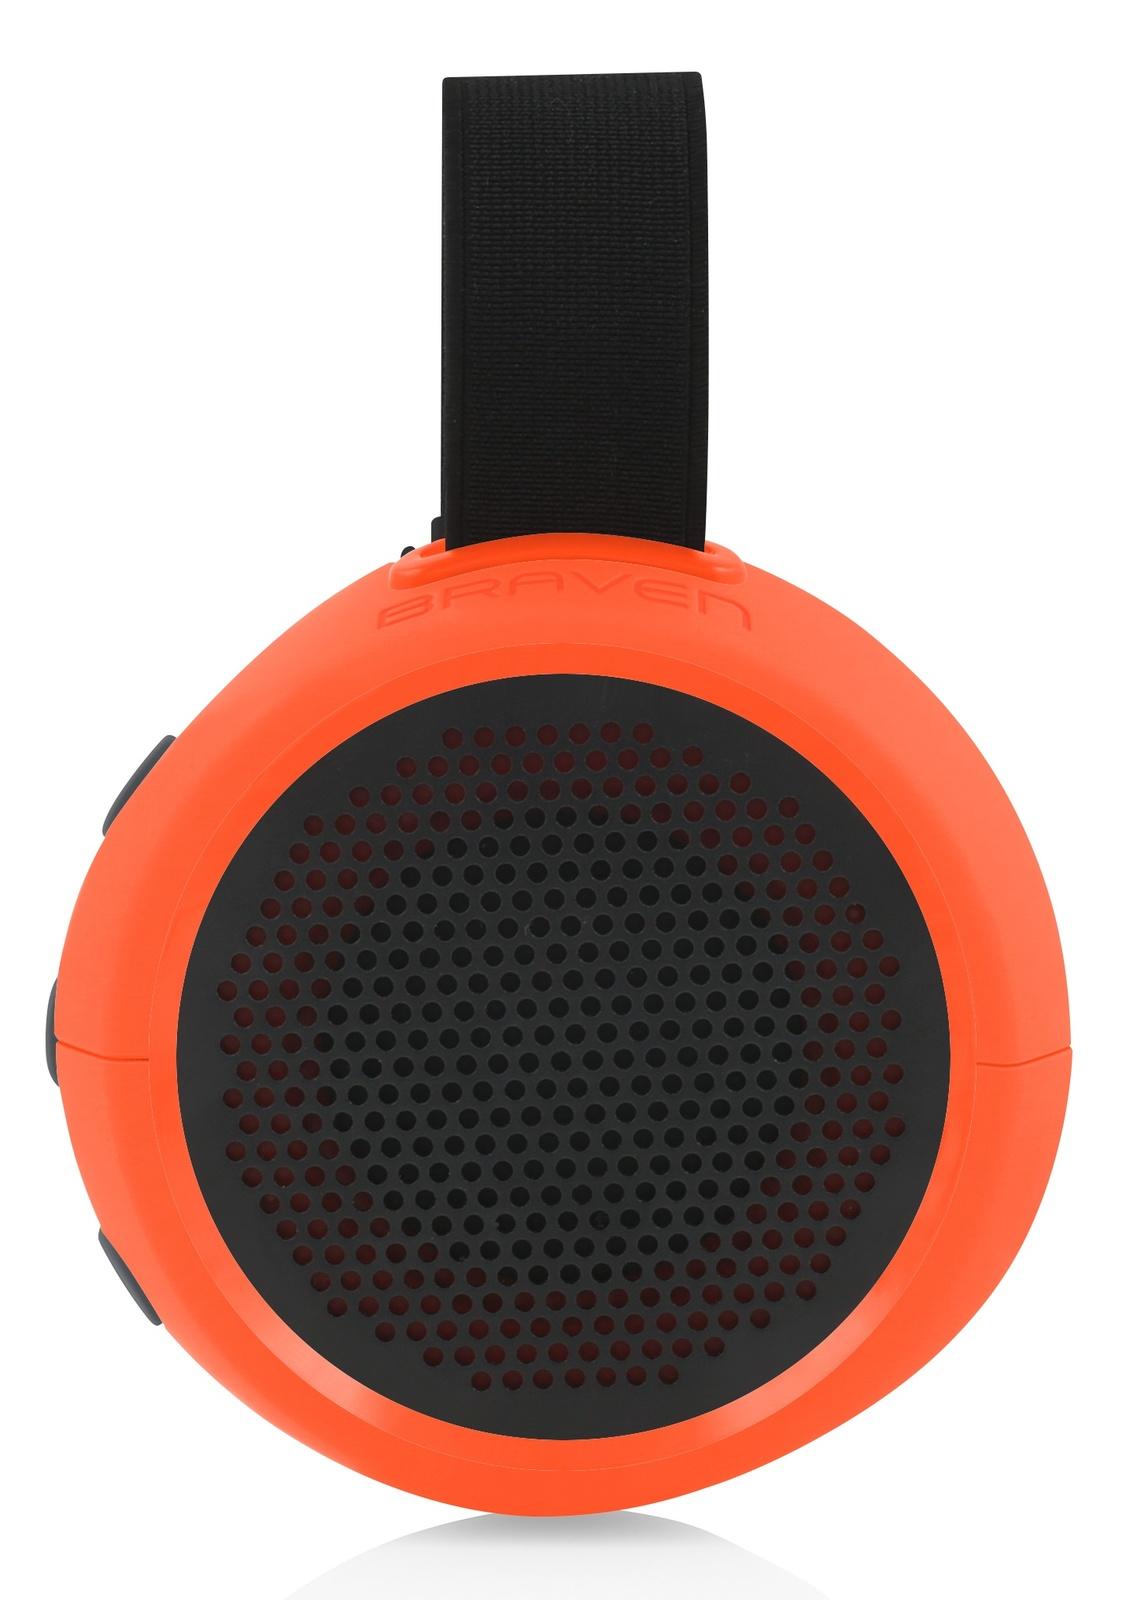 Braven 105 HD Wireless Bluetooth Speaker Waterproof With Action Mount Black NEW